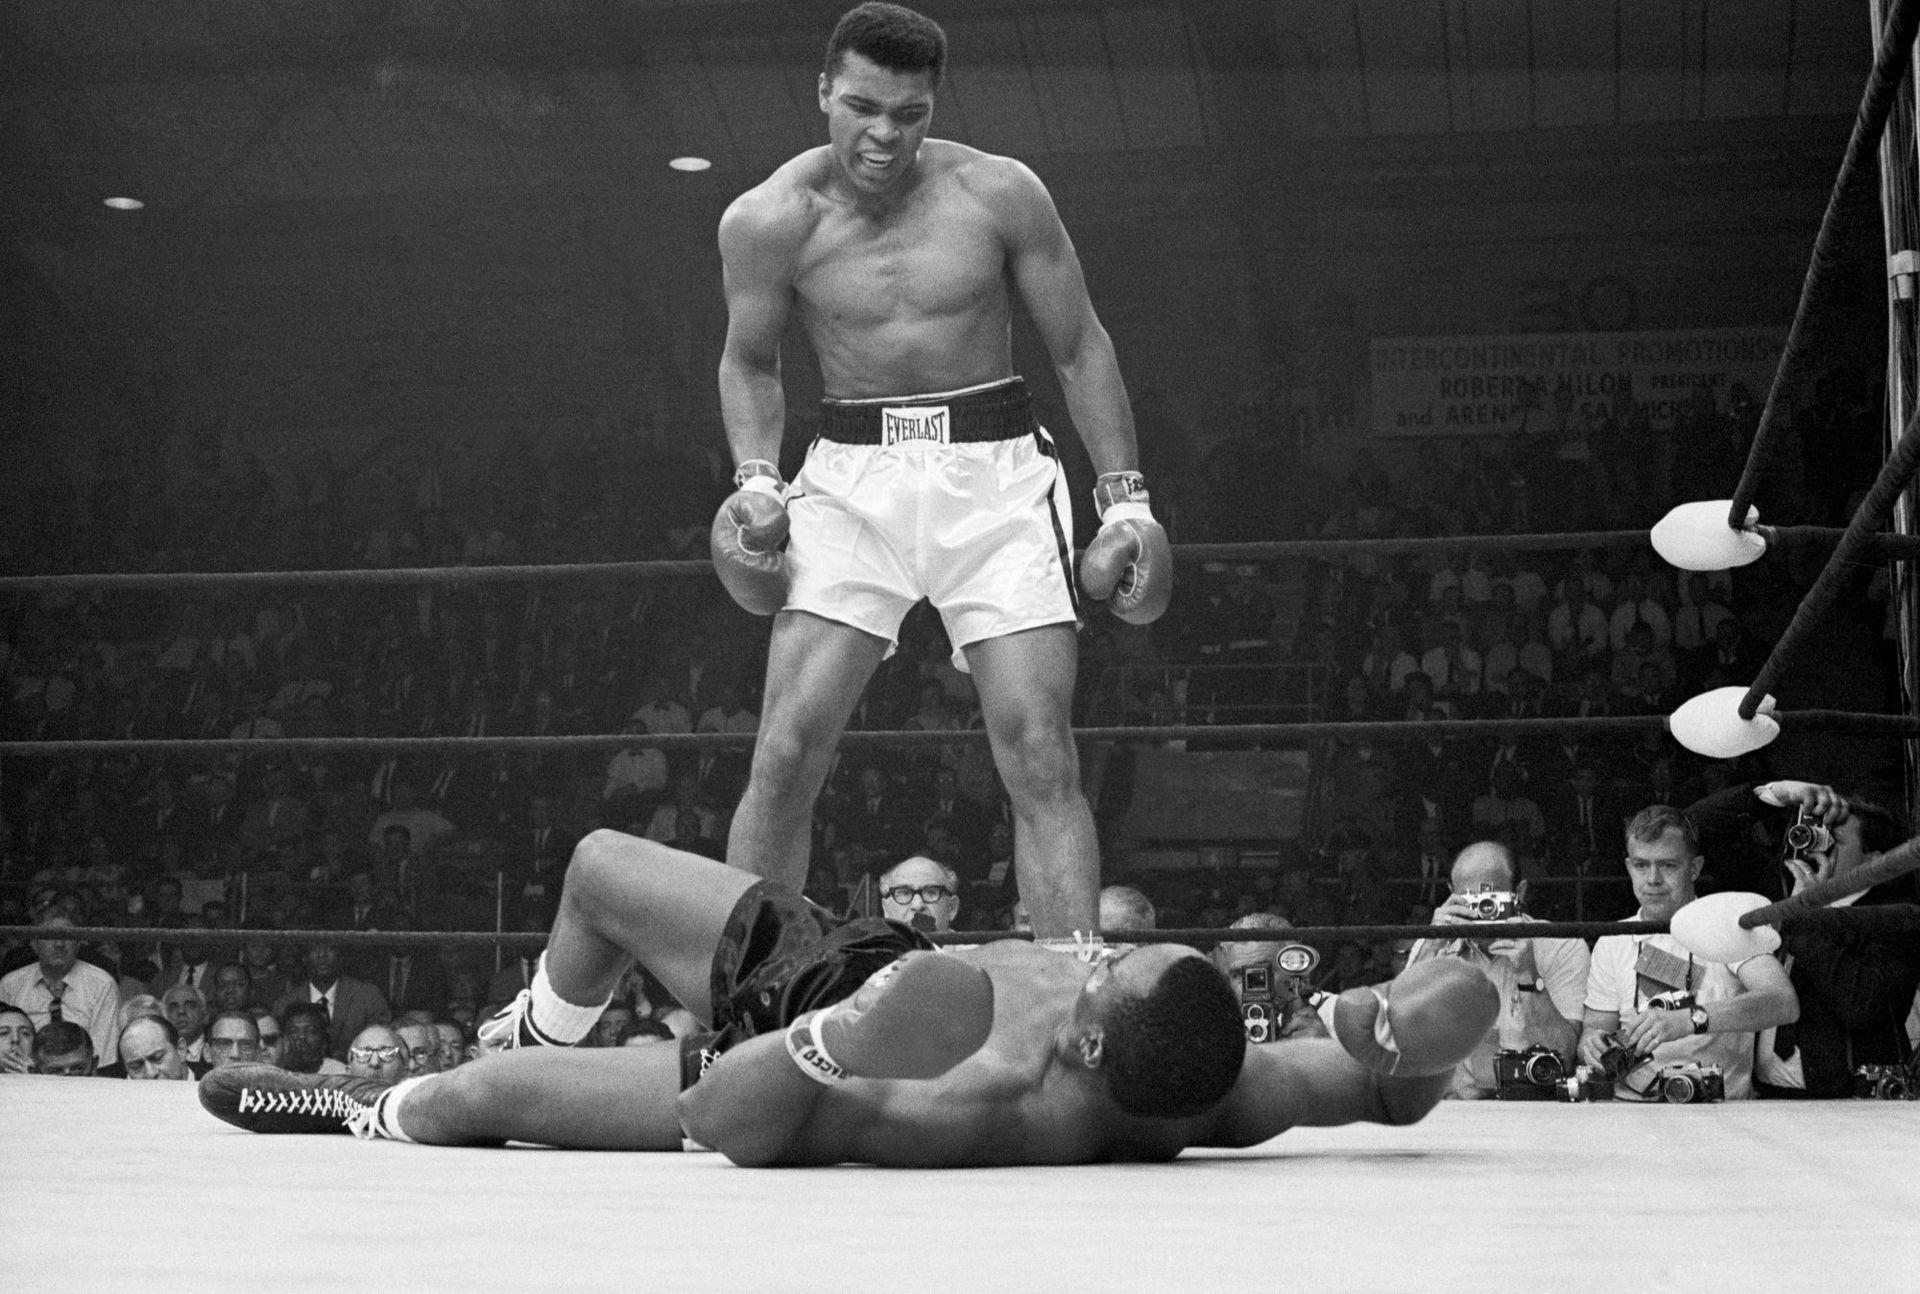 Мохаммед Али против Sony Liston спортивный плакат настенная Картина на холсте декоративная картина для комнаты мальчика спортивная звезда карт...